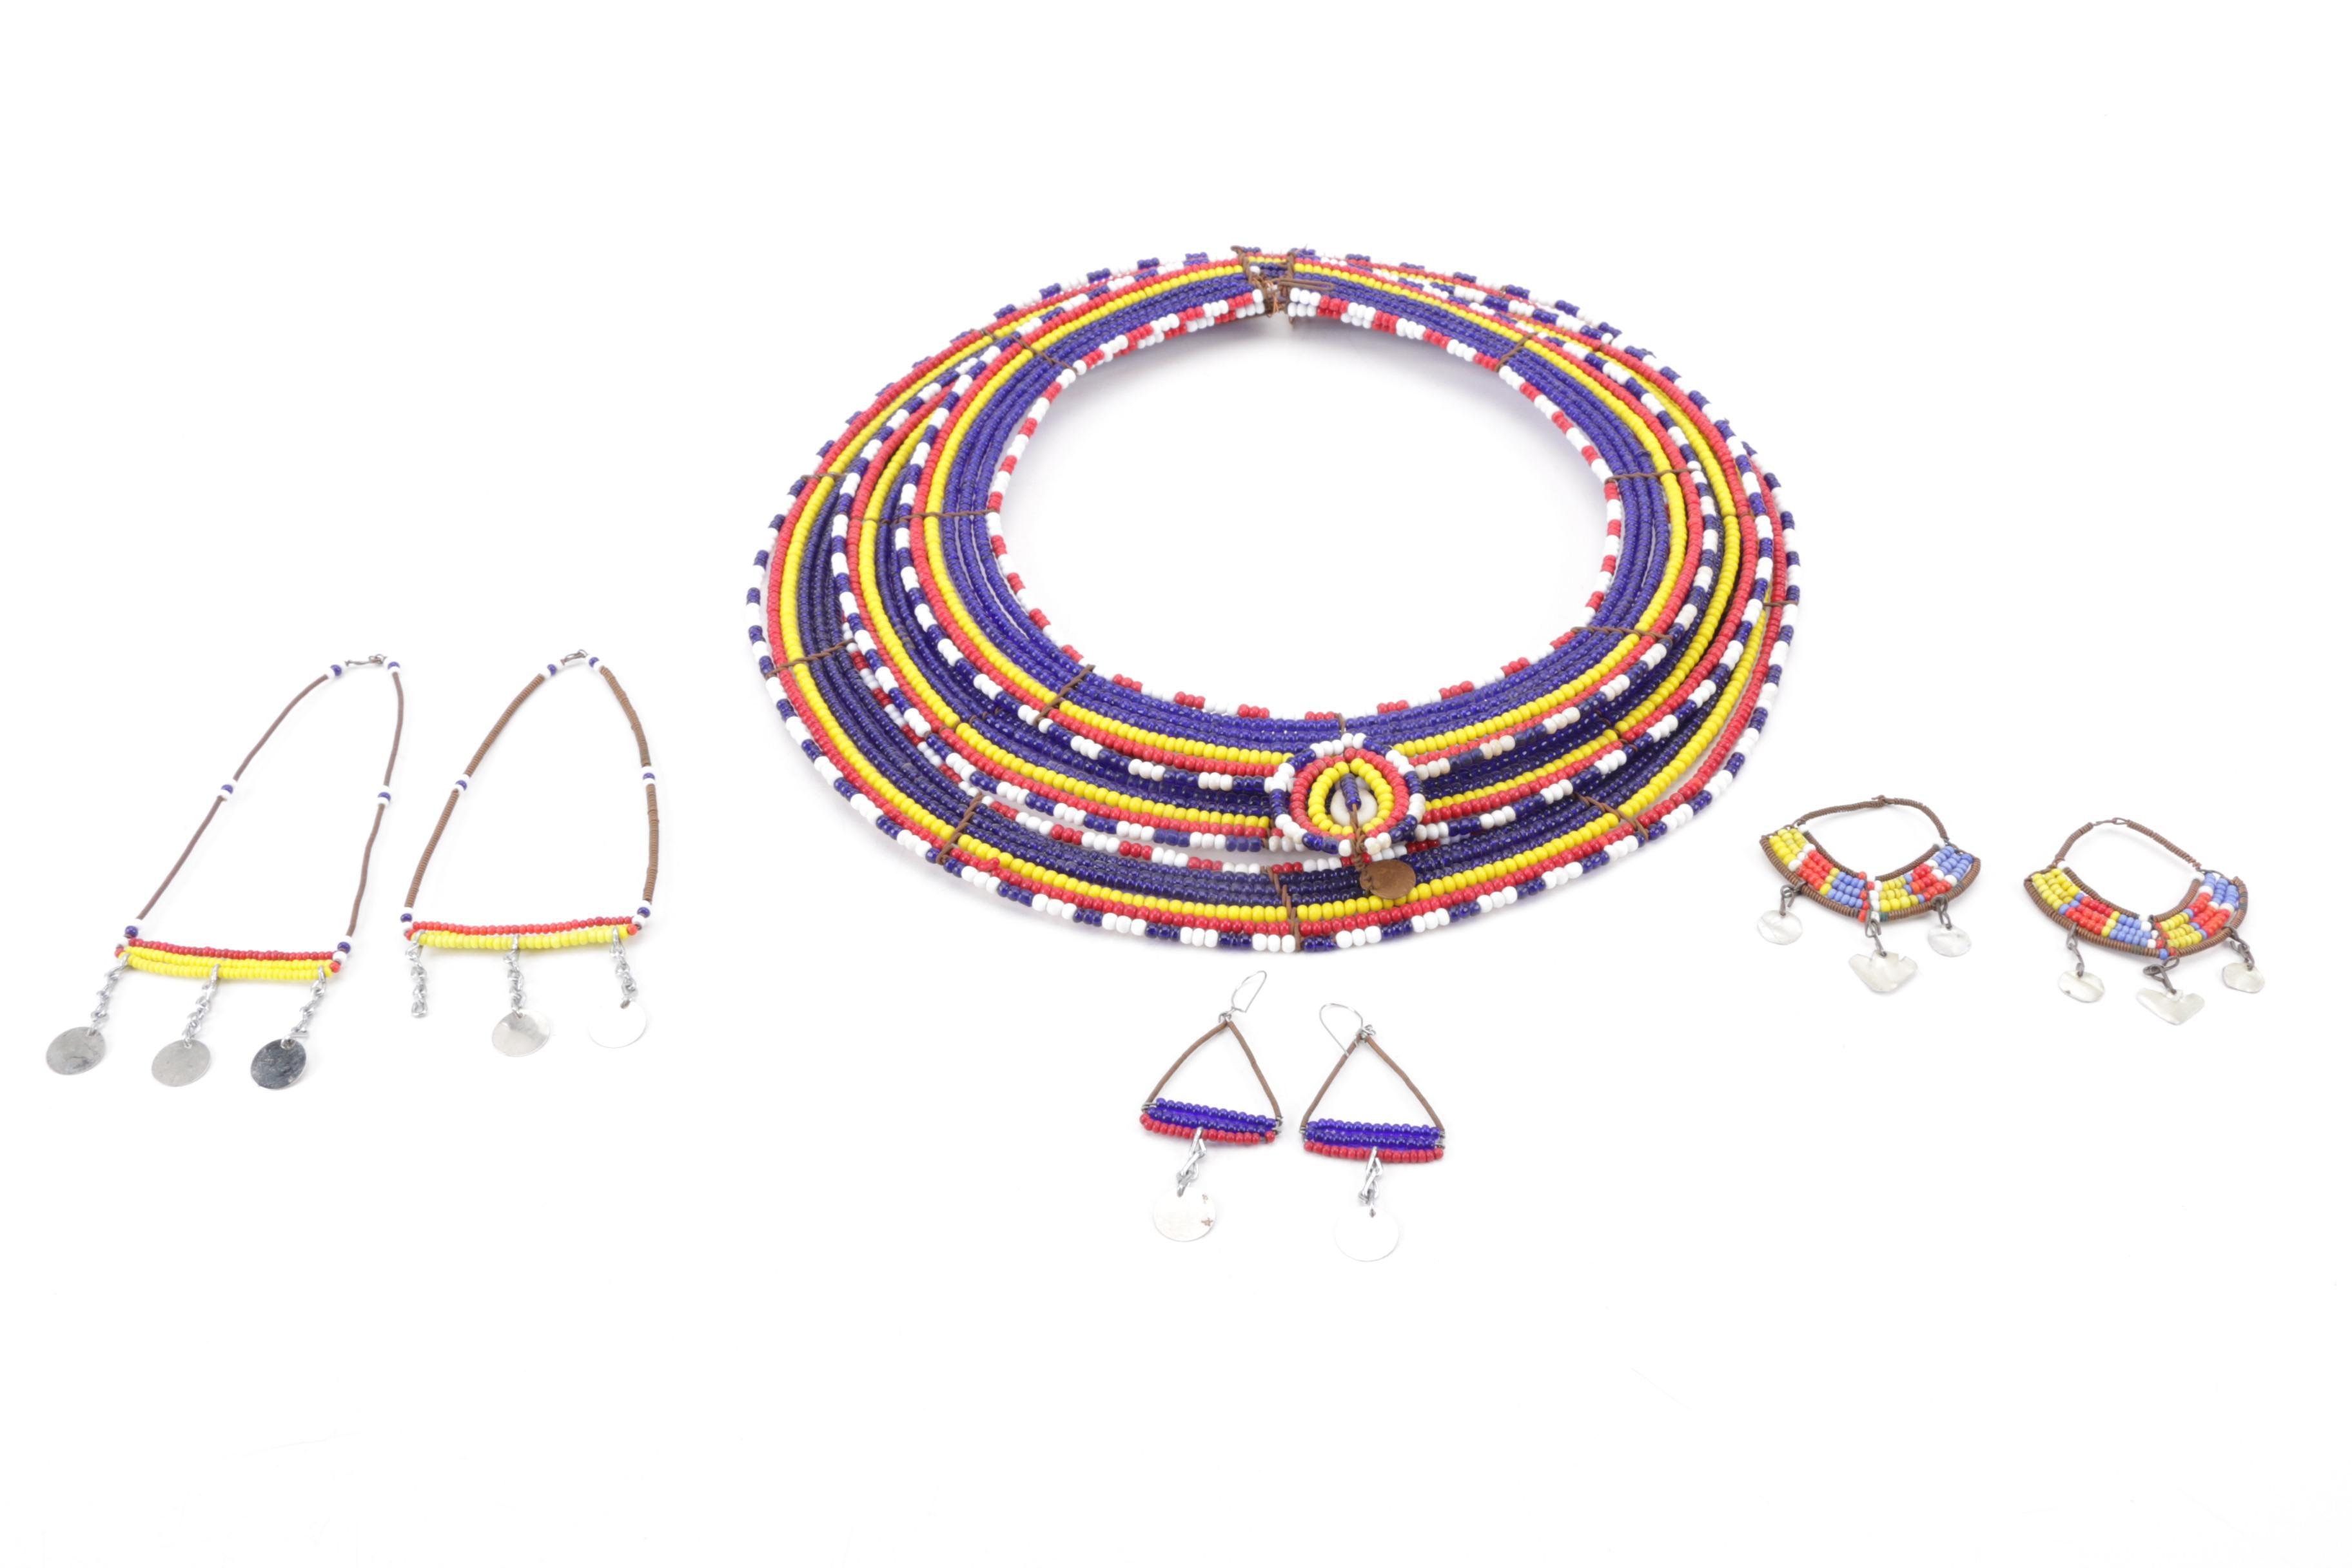 Handmade Kenyan Beaded Necklace and Earrings